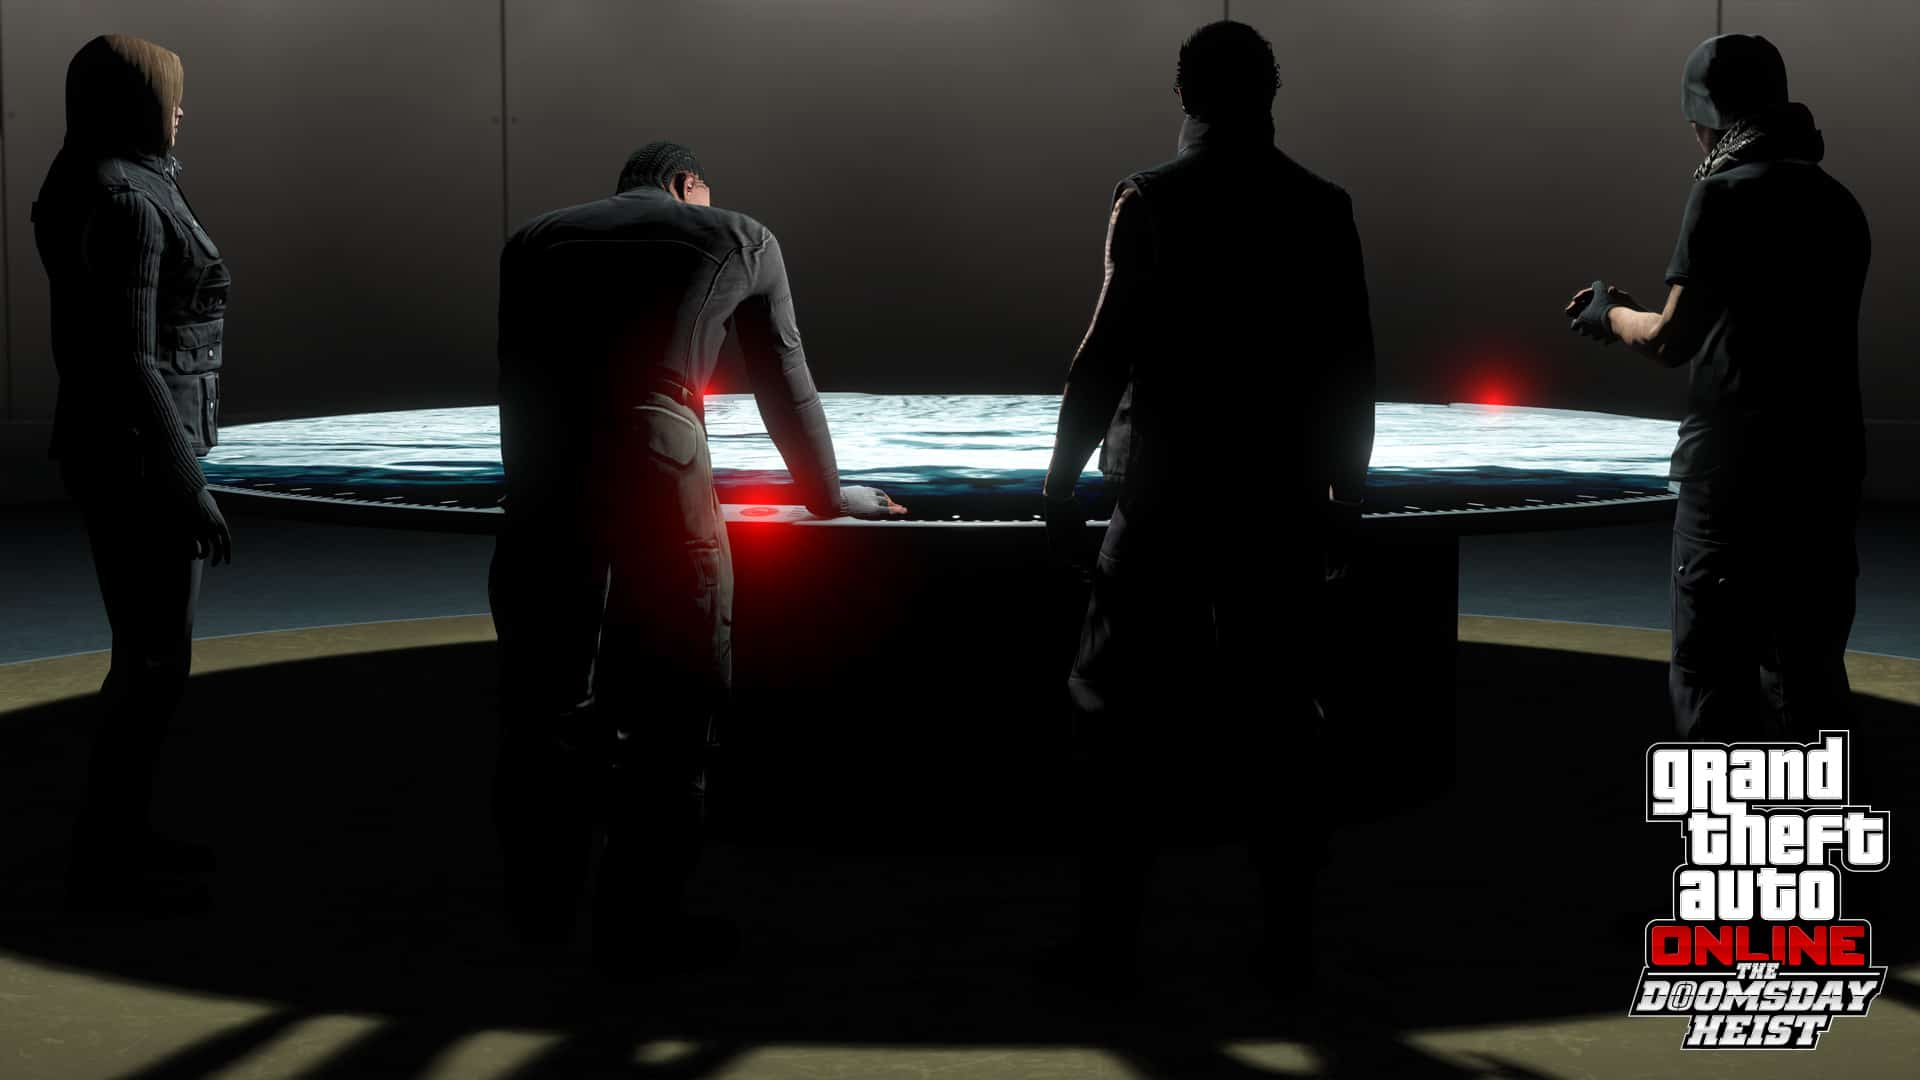 gta v the doomsday heist trailer